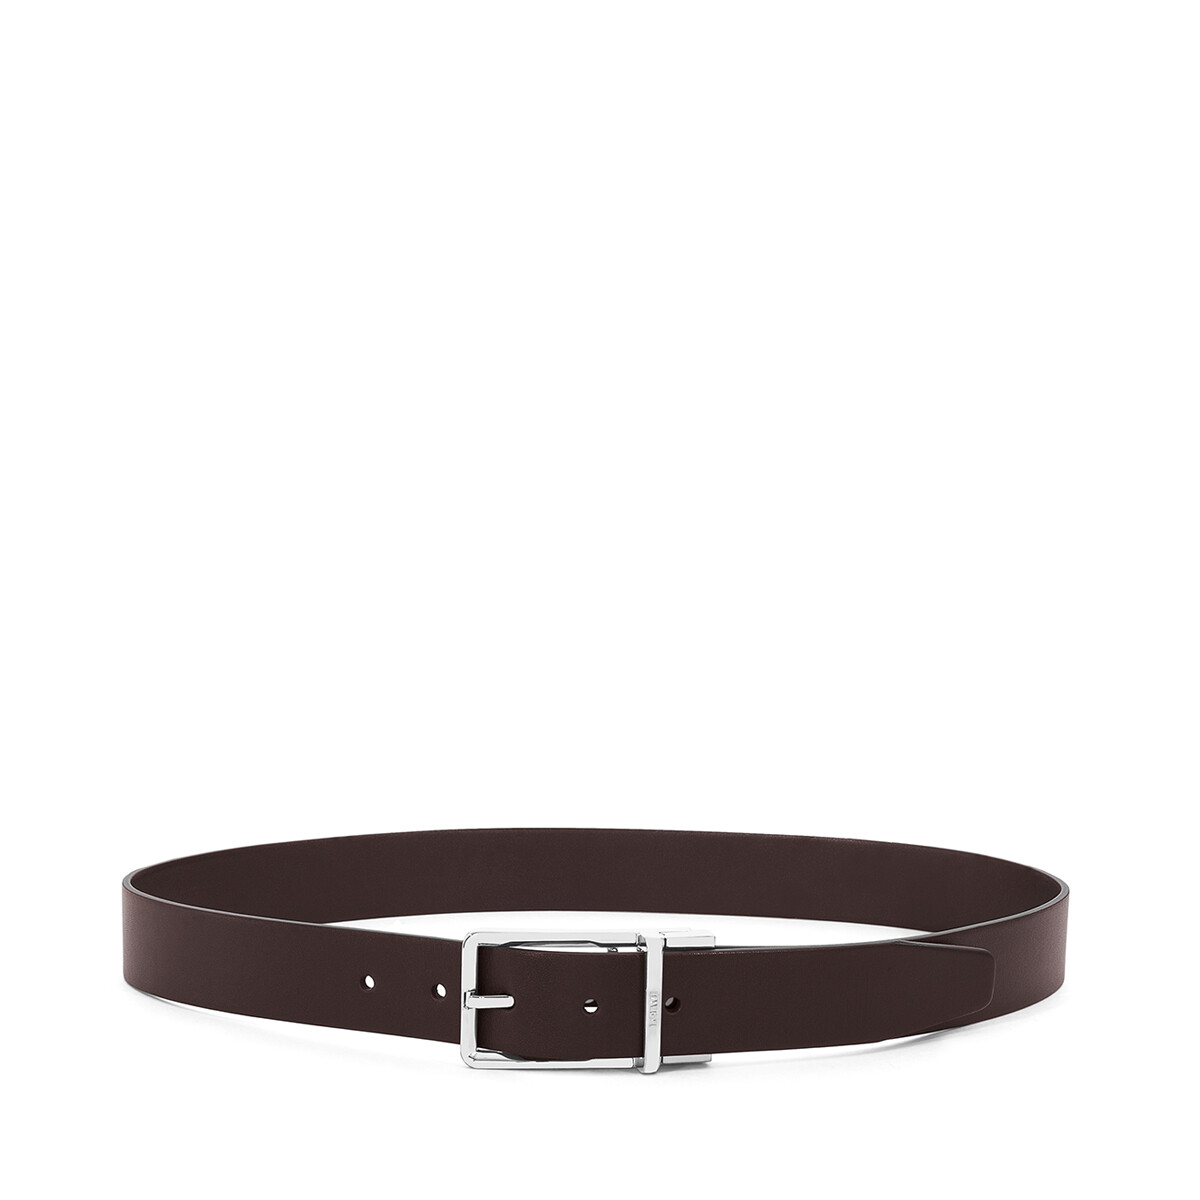 LOEWE Formal Belt 3.2Cm Adj/Rev black/dark brown/ruthenium front